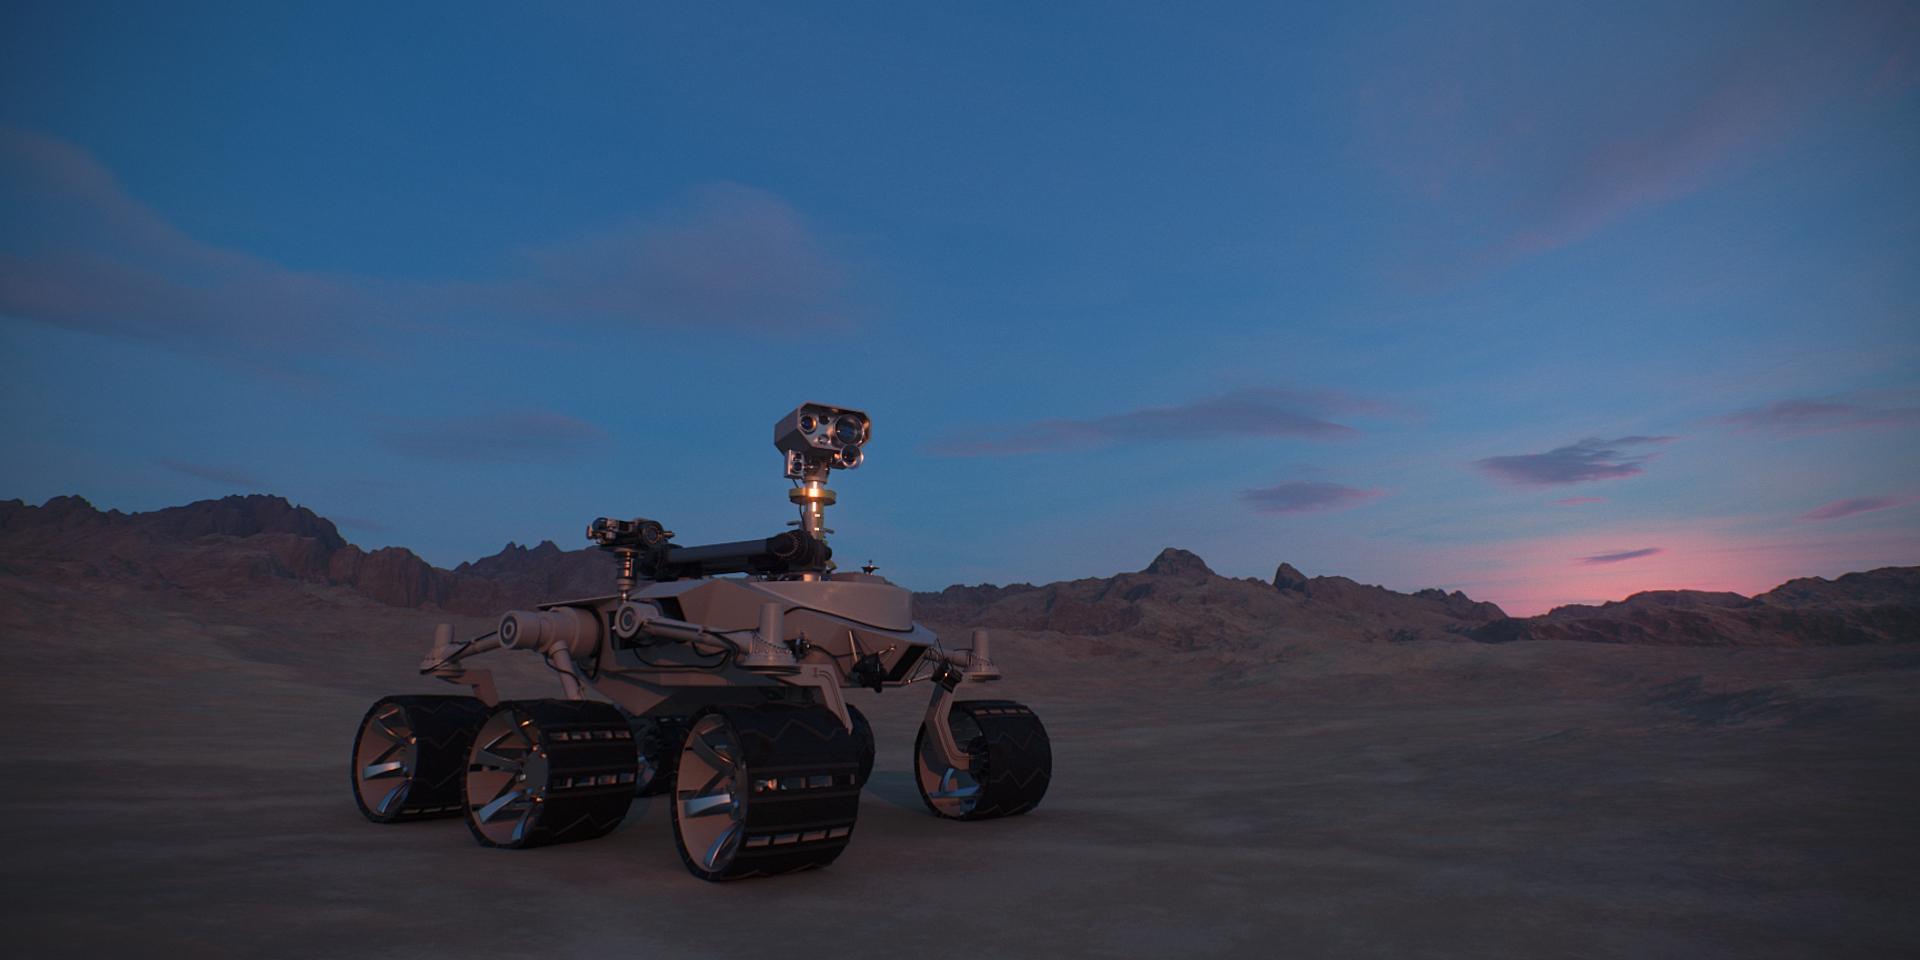 Rover Scene Alien Skies 07 Camera A.jpg